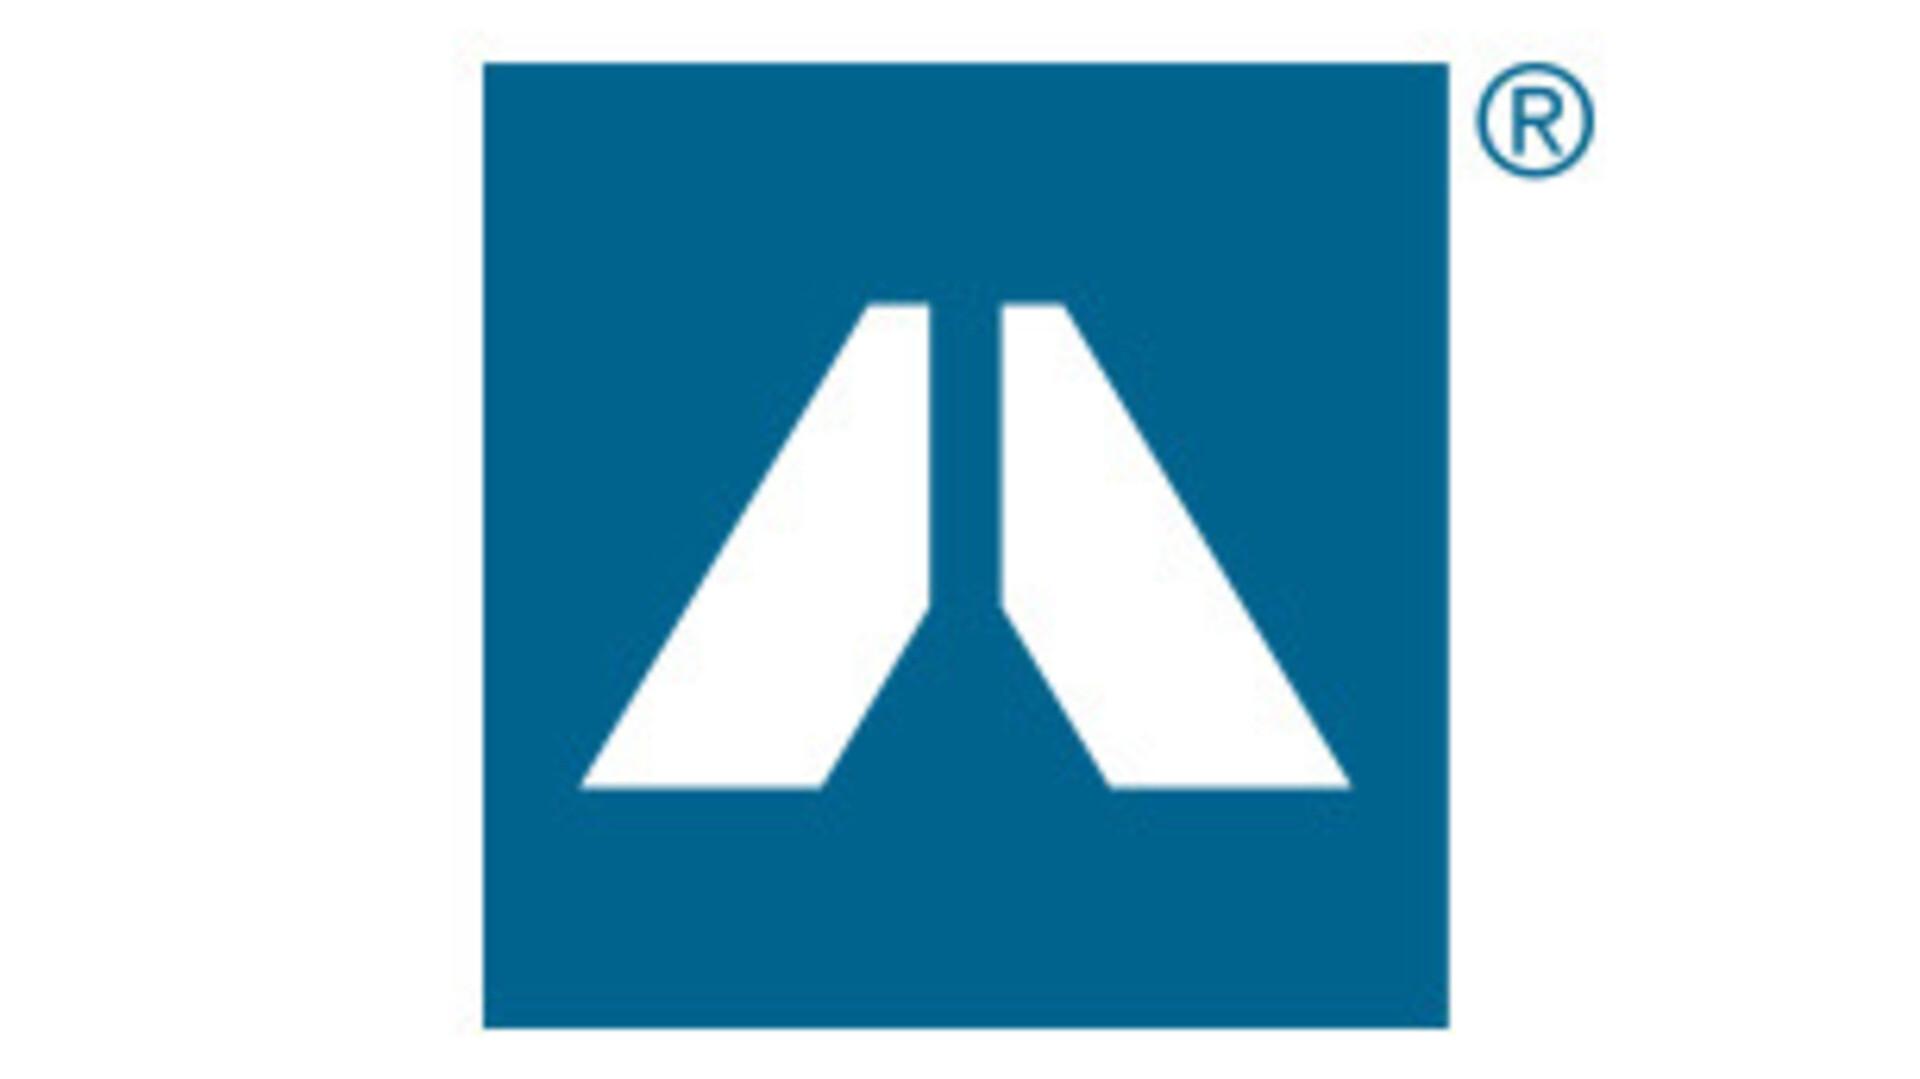 RGB Rockfon® symbol